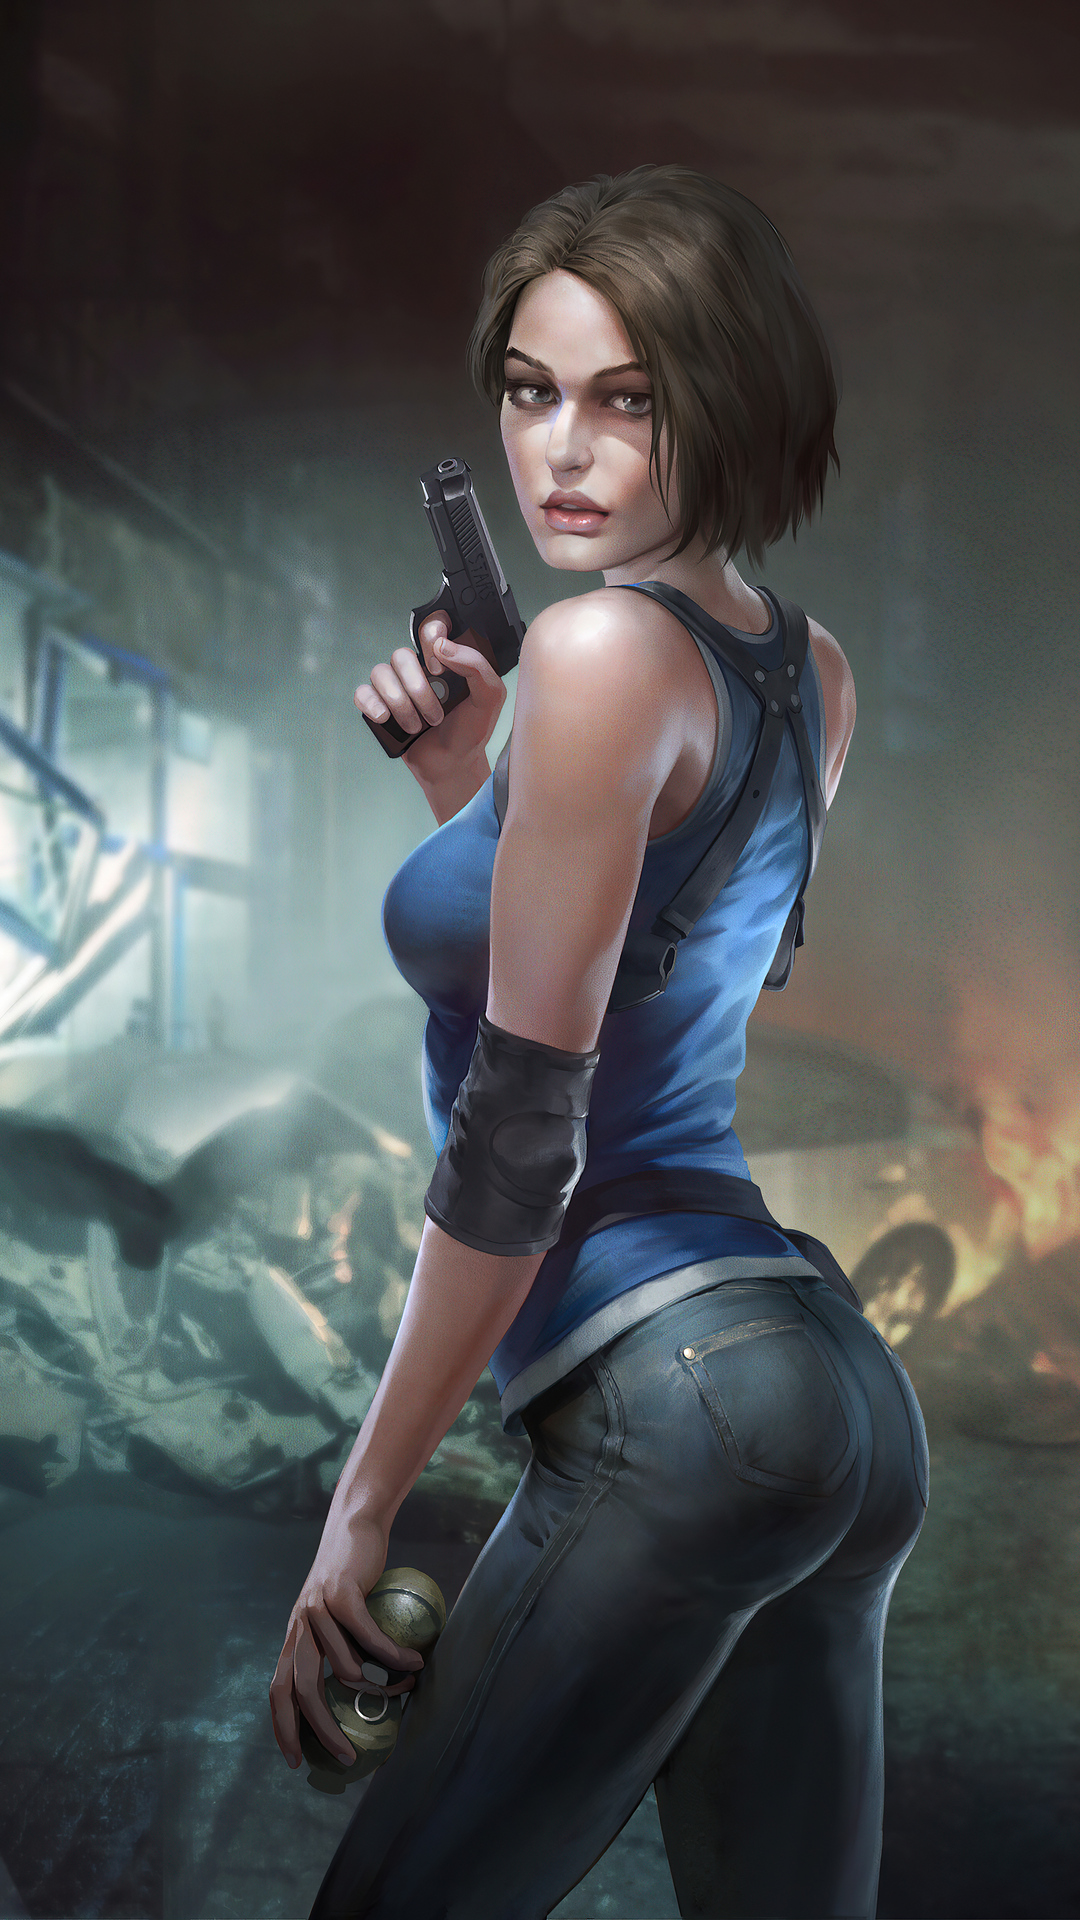 #346507 Jill Valentine, RE3, Resident Evil 3, Remake